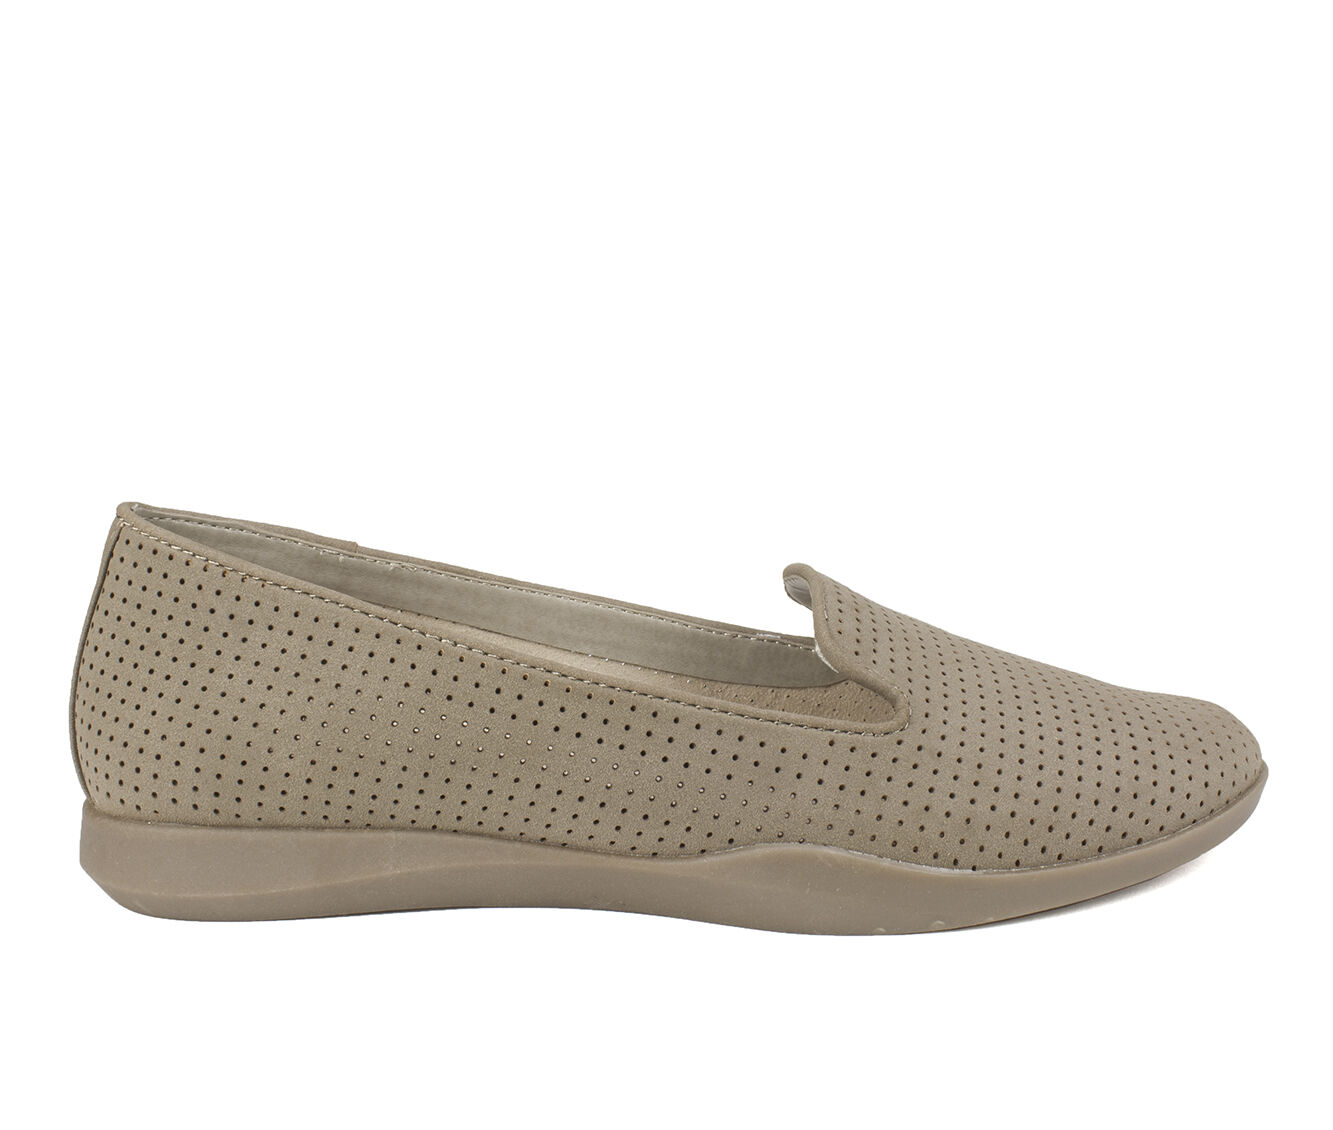 uk shoes_kd3106